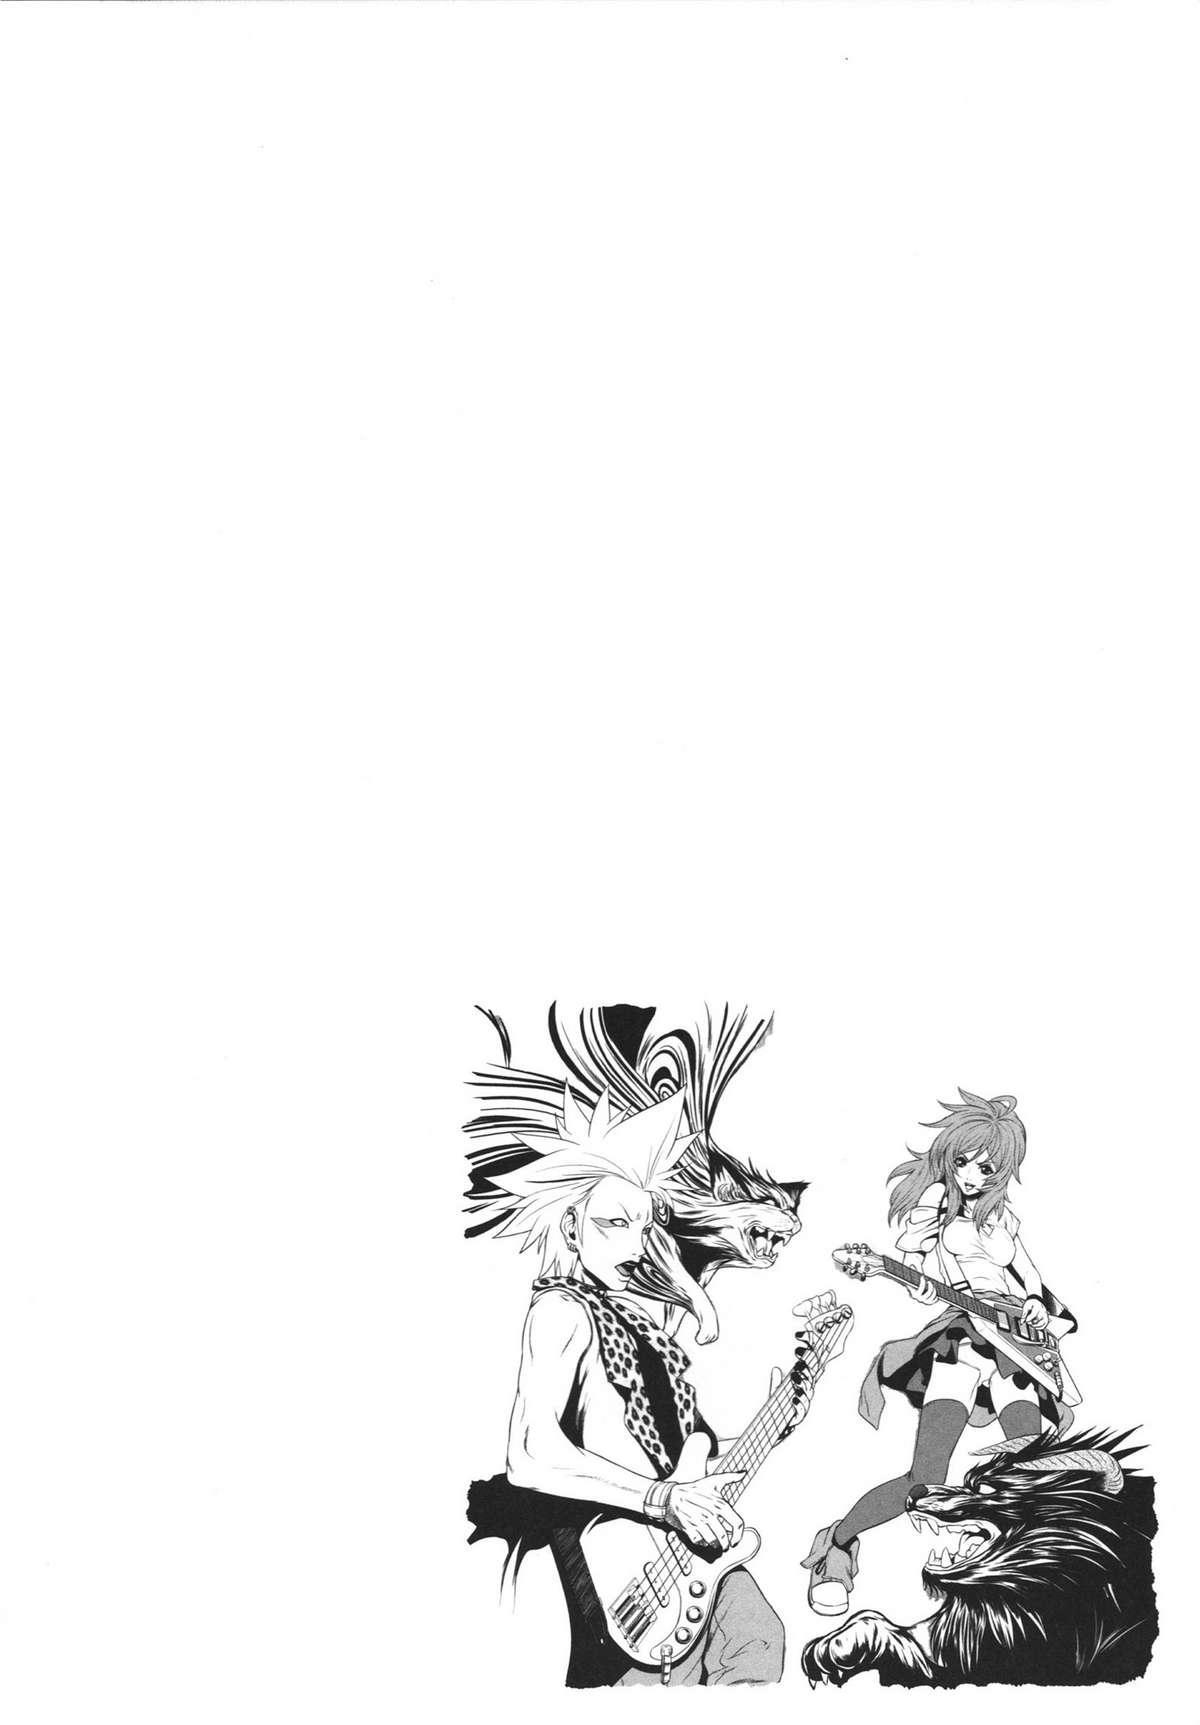 [Kawazuko Chouji] m7 -Minor Seven- Jou 93